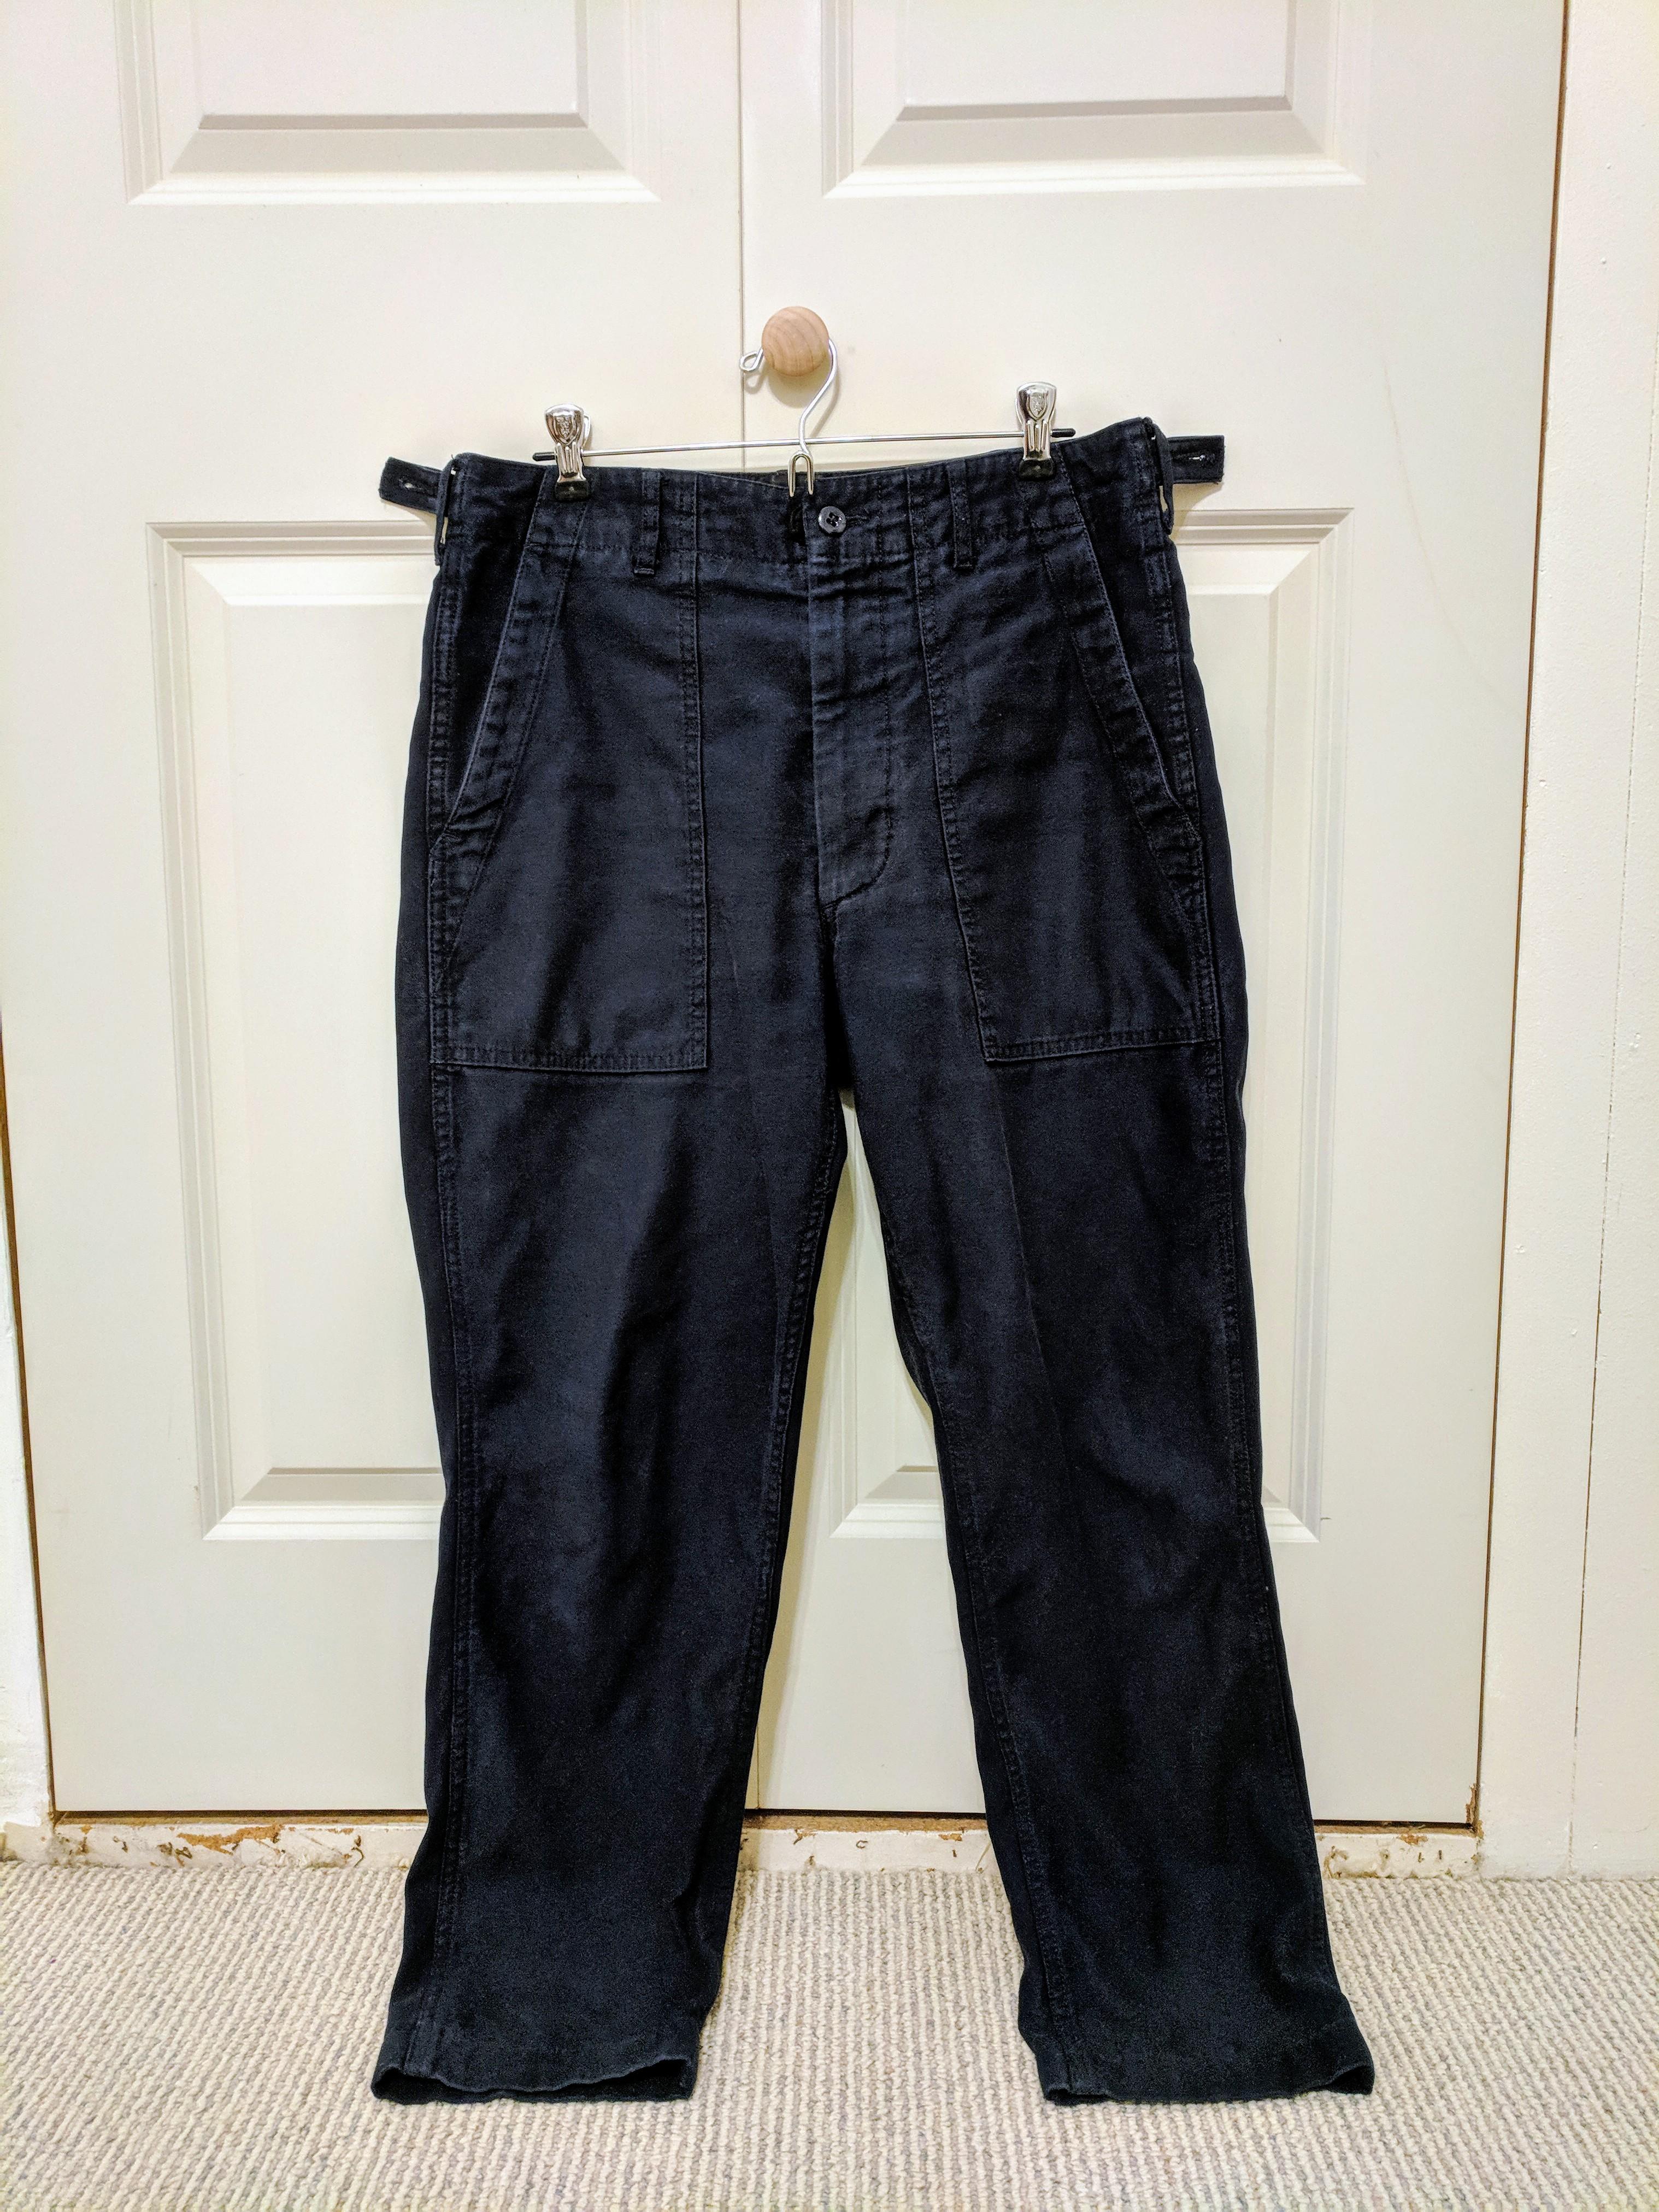 Engineered Garments Navy Blue Fatigue Pant Size 30 - Casual Pants ... 01c5e8415aa